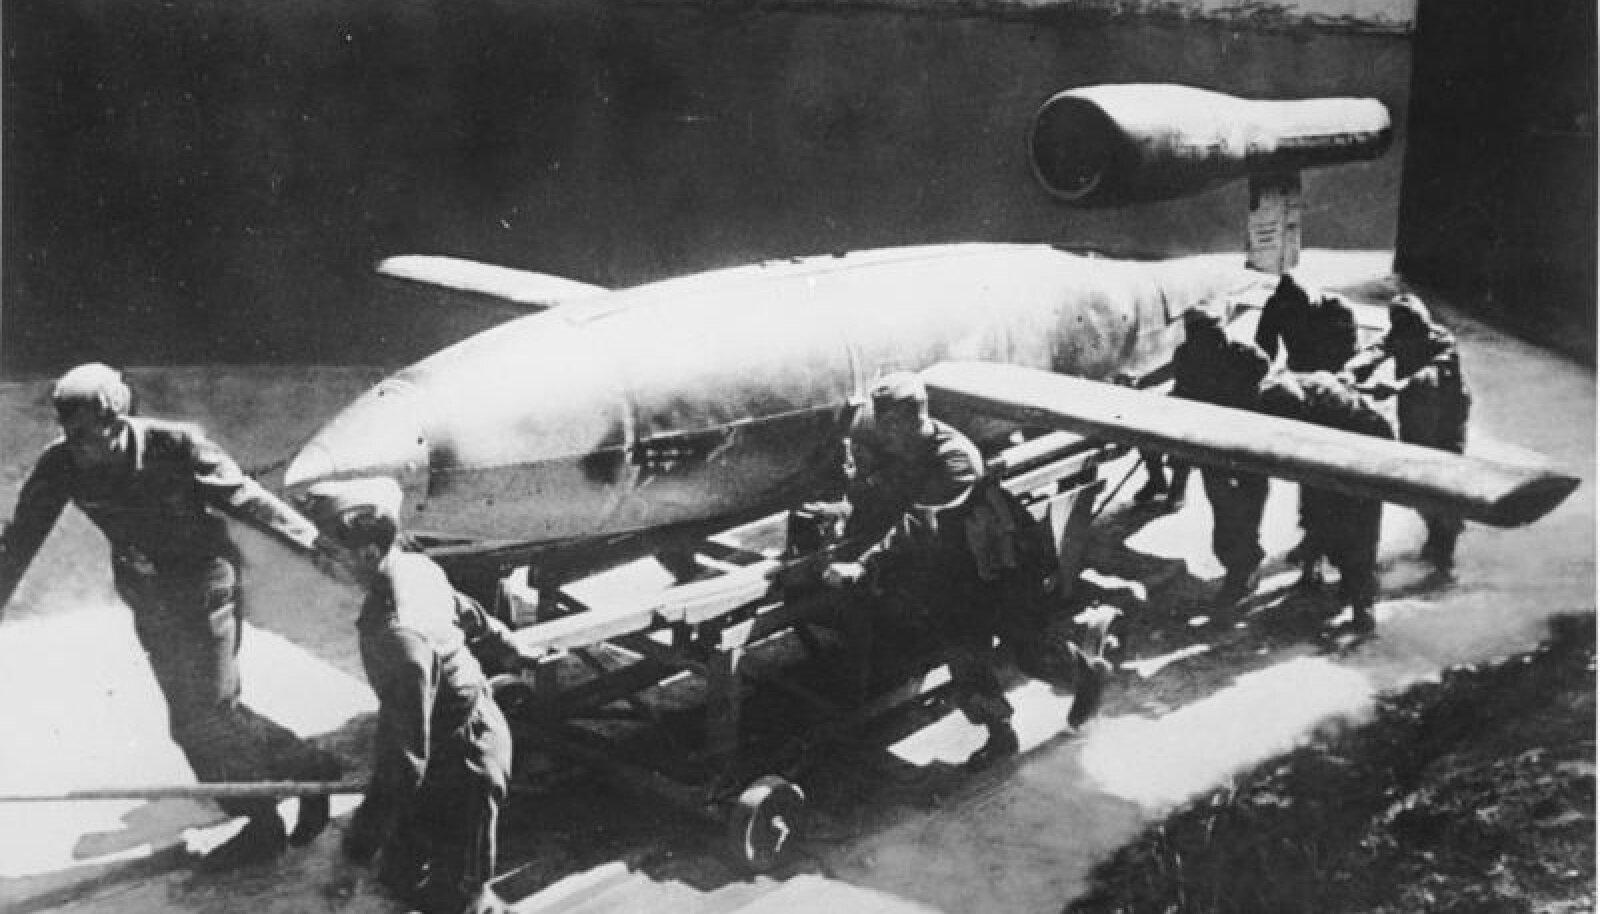 V1 rakett viiakse stardipaika. Foto: Bundesarchiv